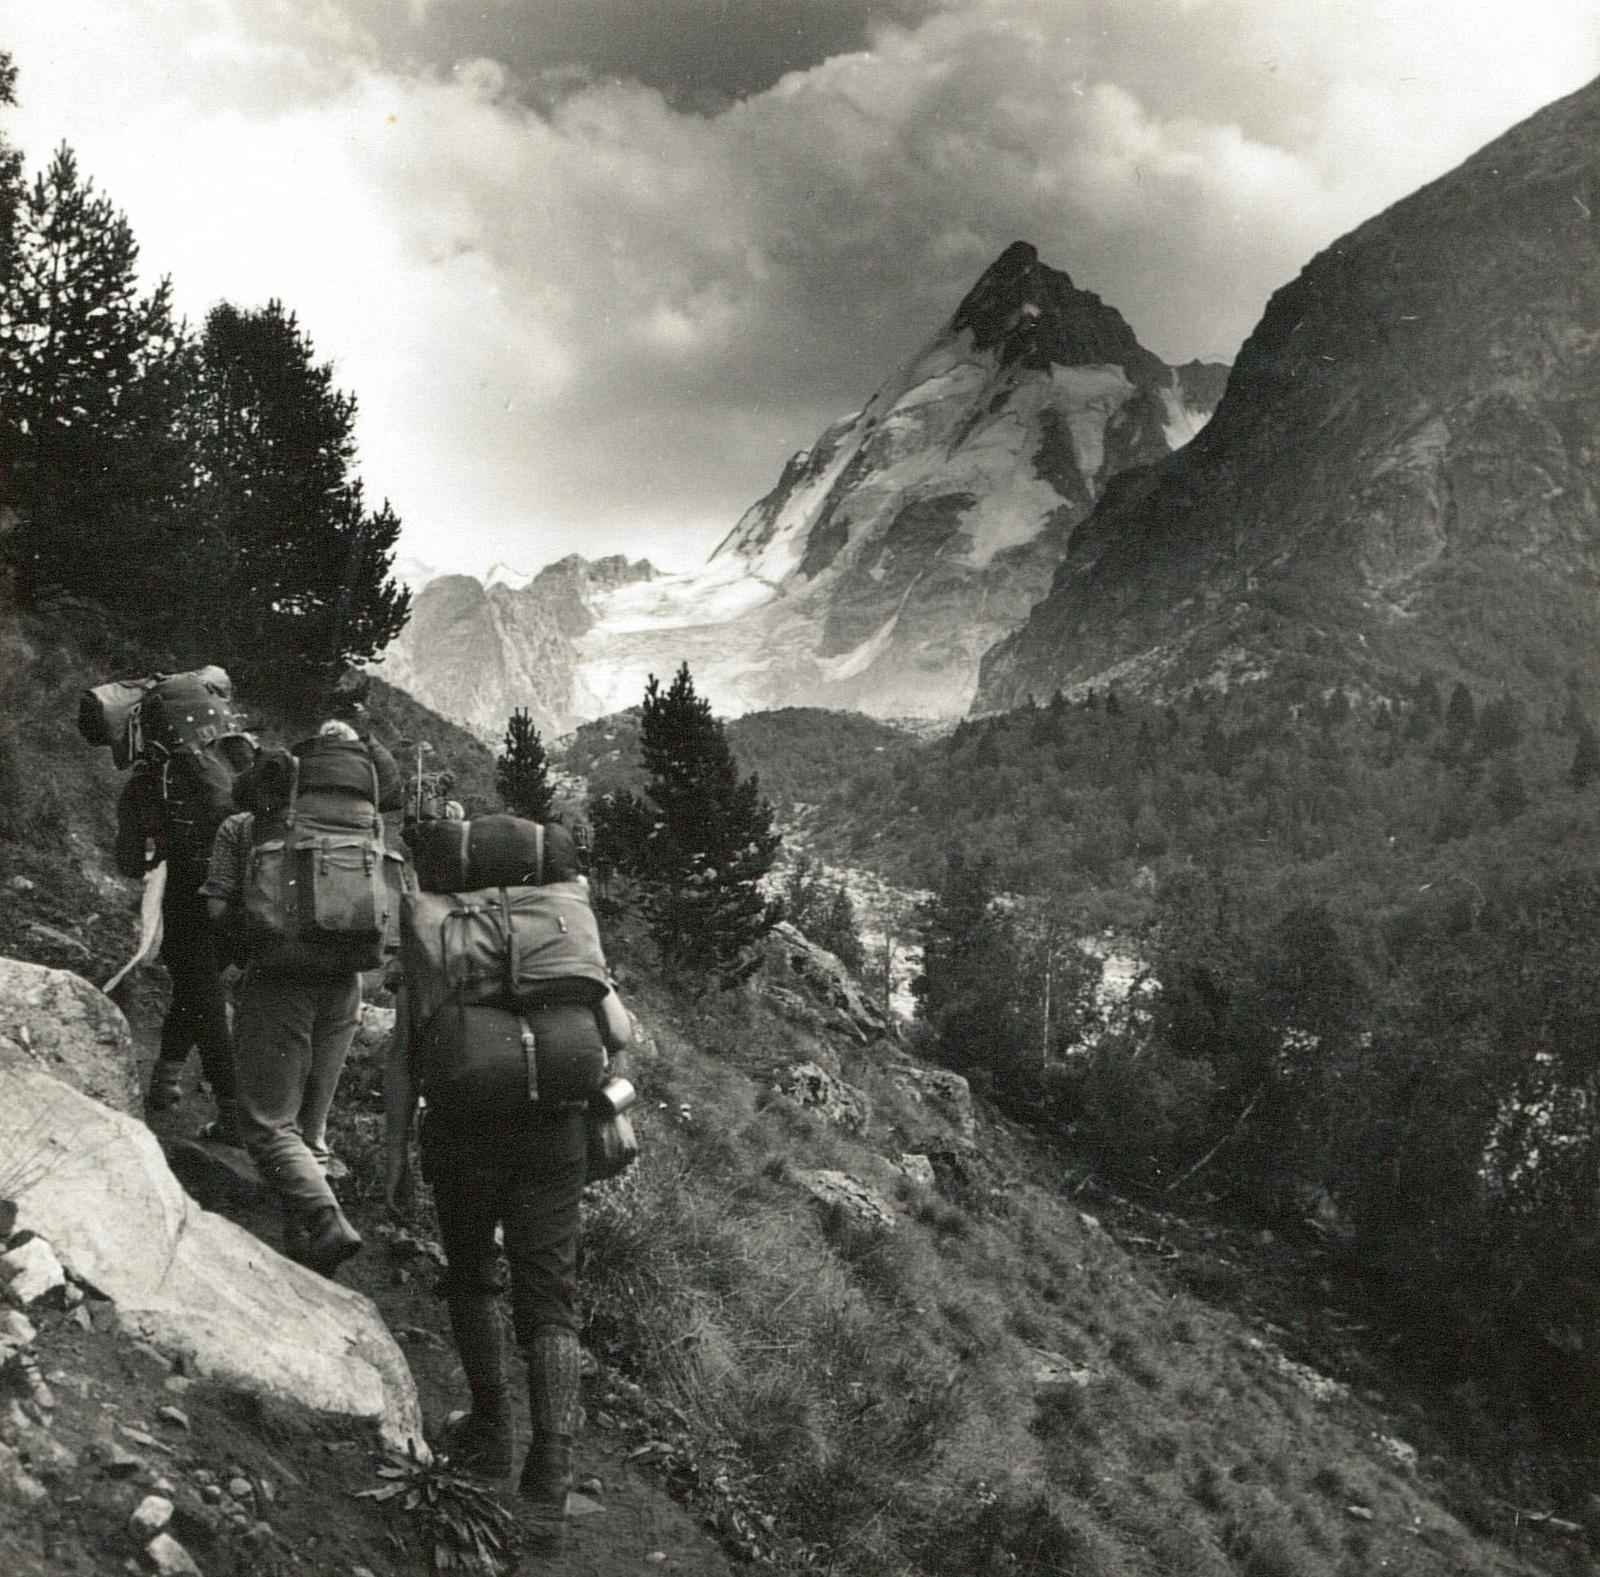 Центральный Кавказ. Долина Адылсу с базой «Джан-Туган» (3911 м)